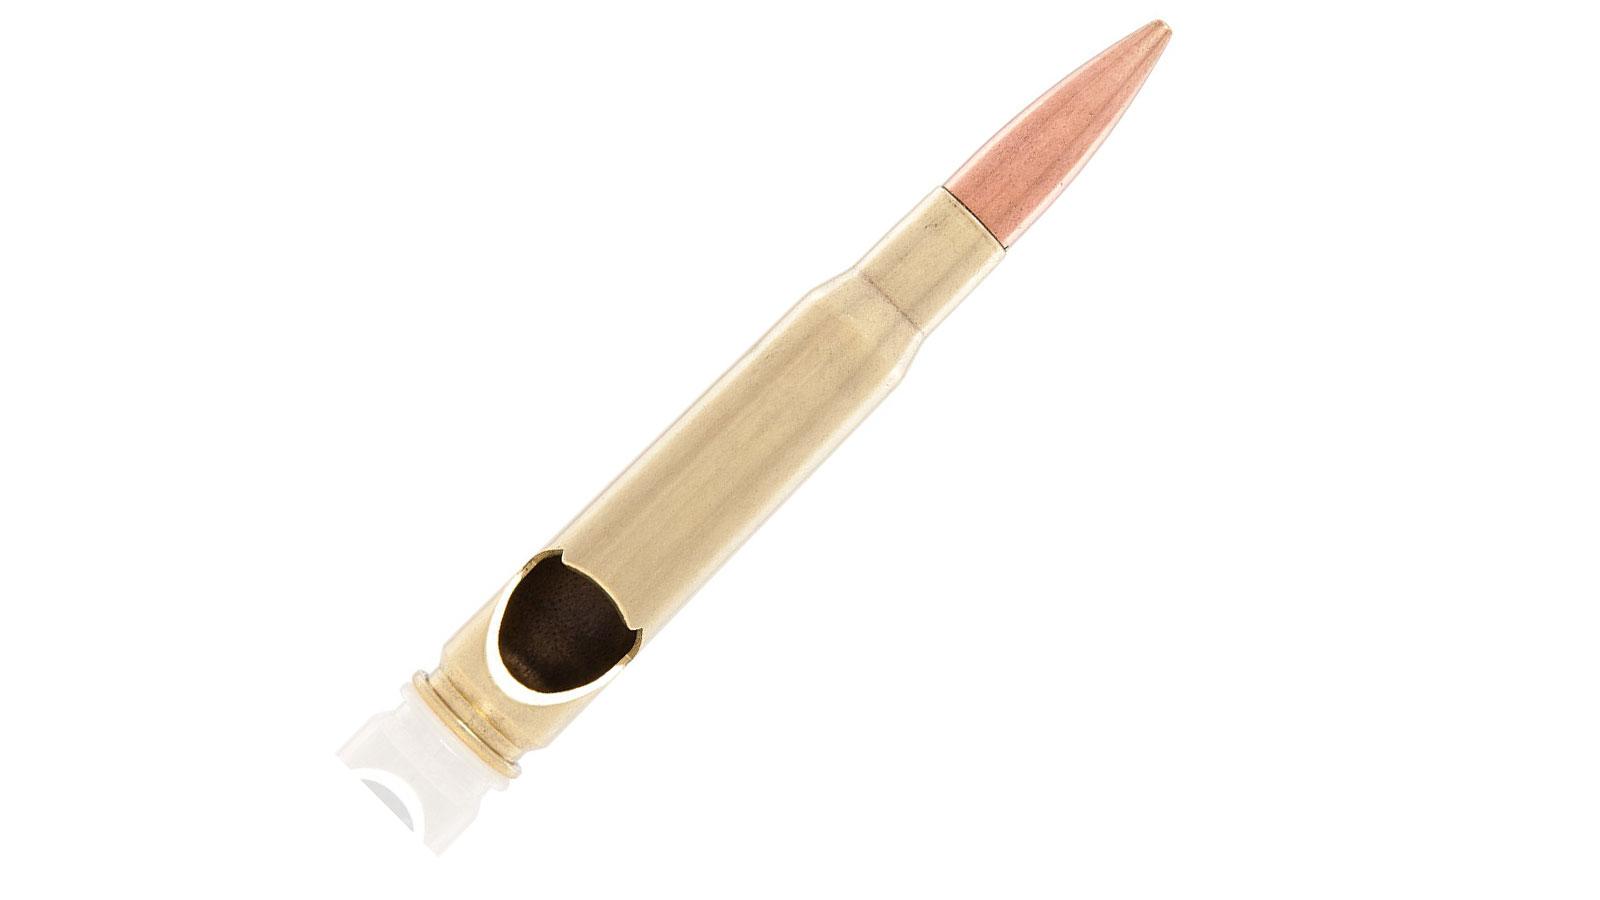 50 Caliber BMG Real Bullet Bottle Opener | cool bottle openers for men